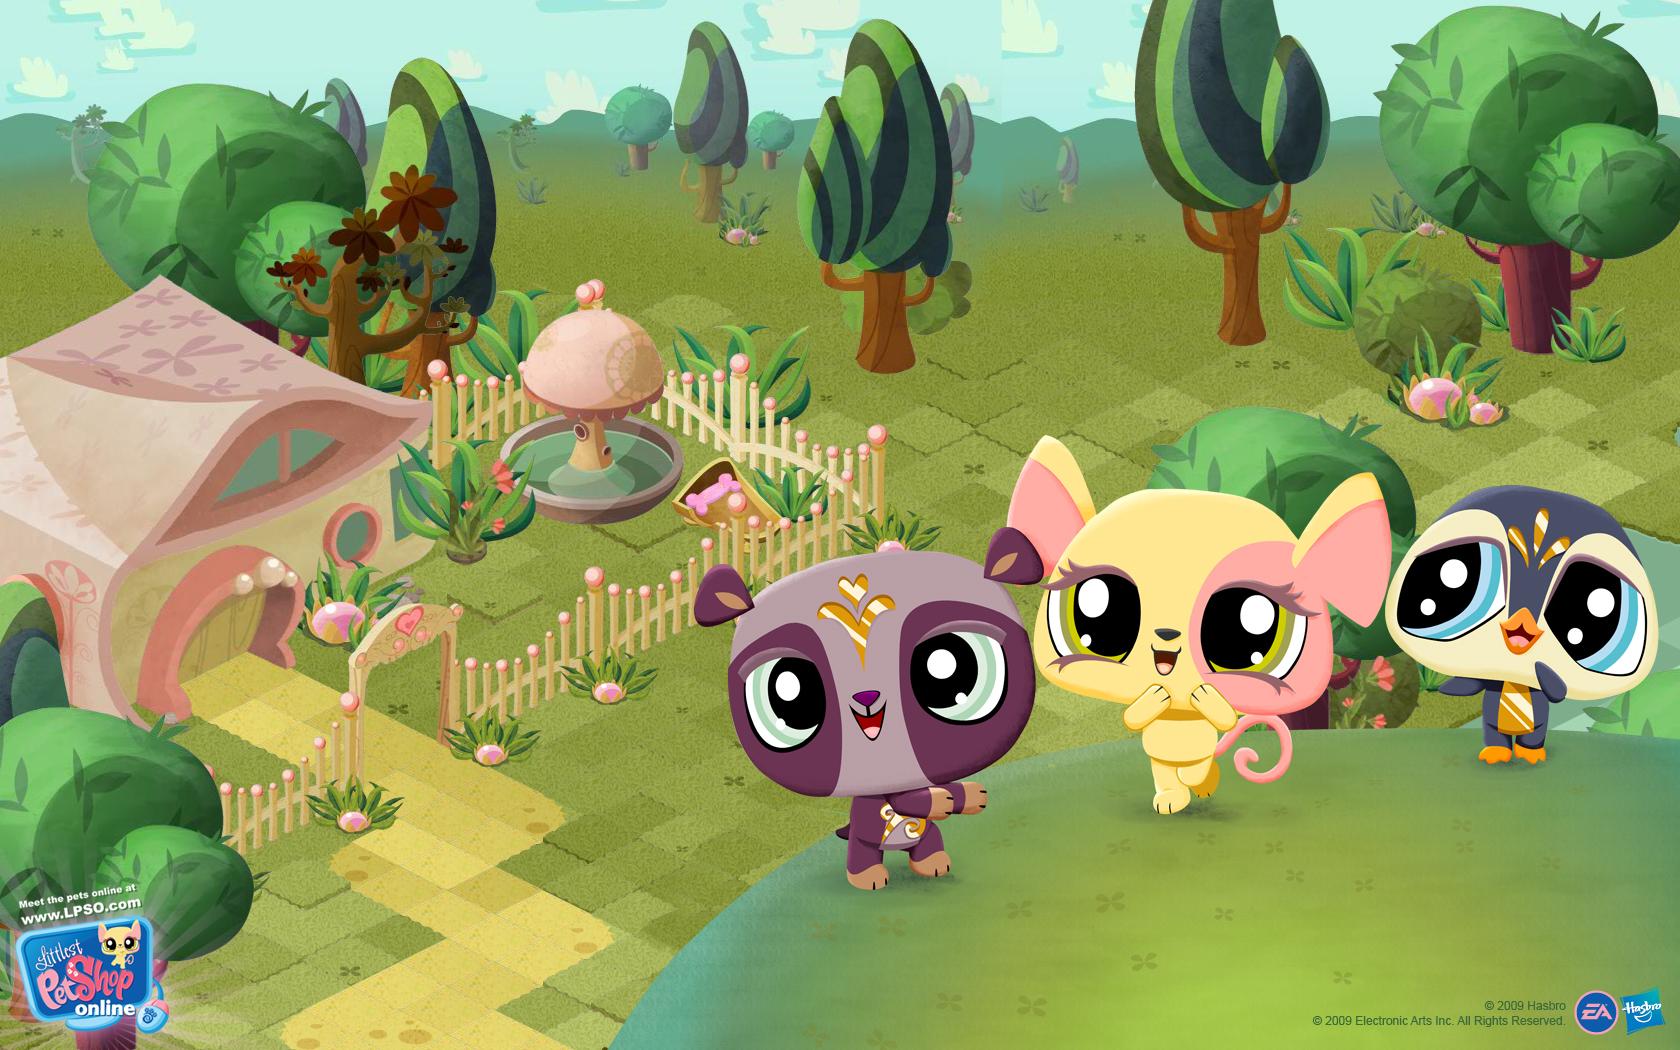 Shop wallpaper online wallpapersafari littlest pet shop online wallpaper for the game wallpapers voltagebd Choice Image